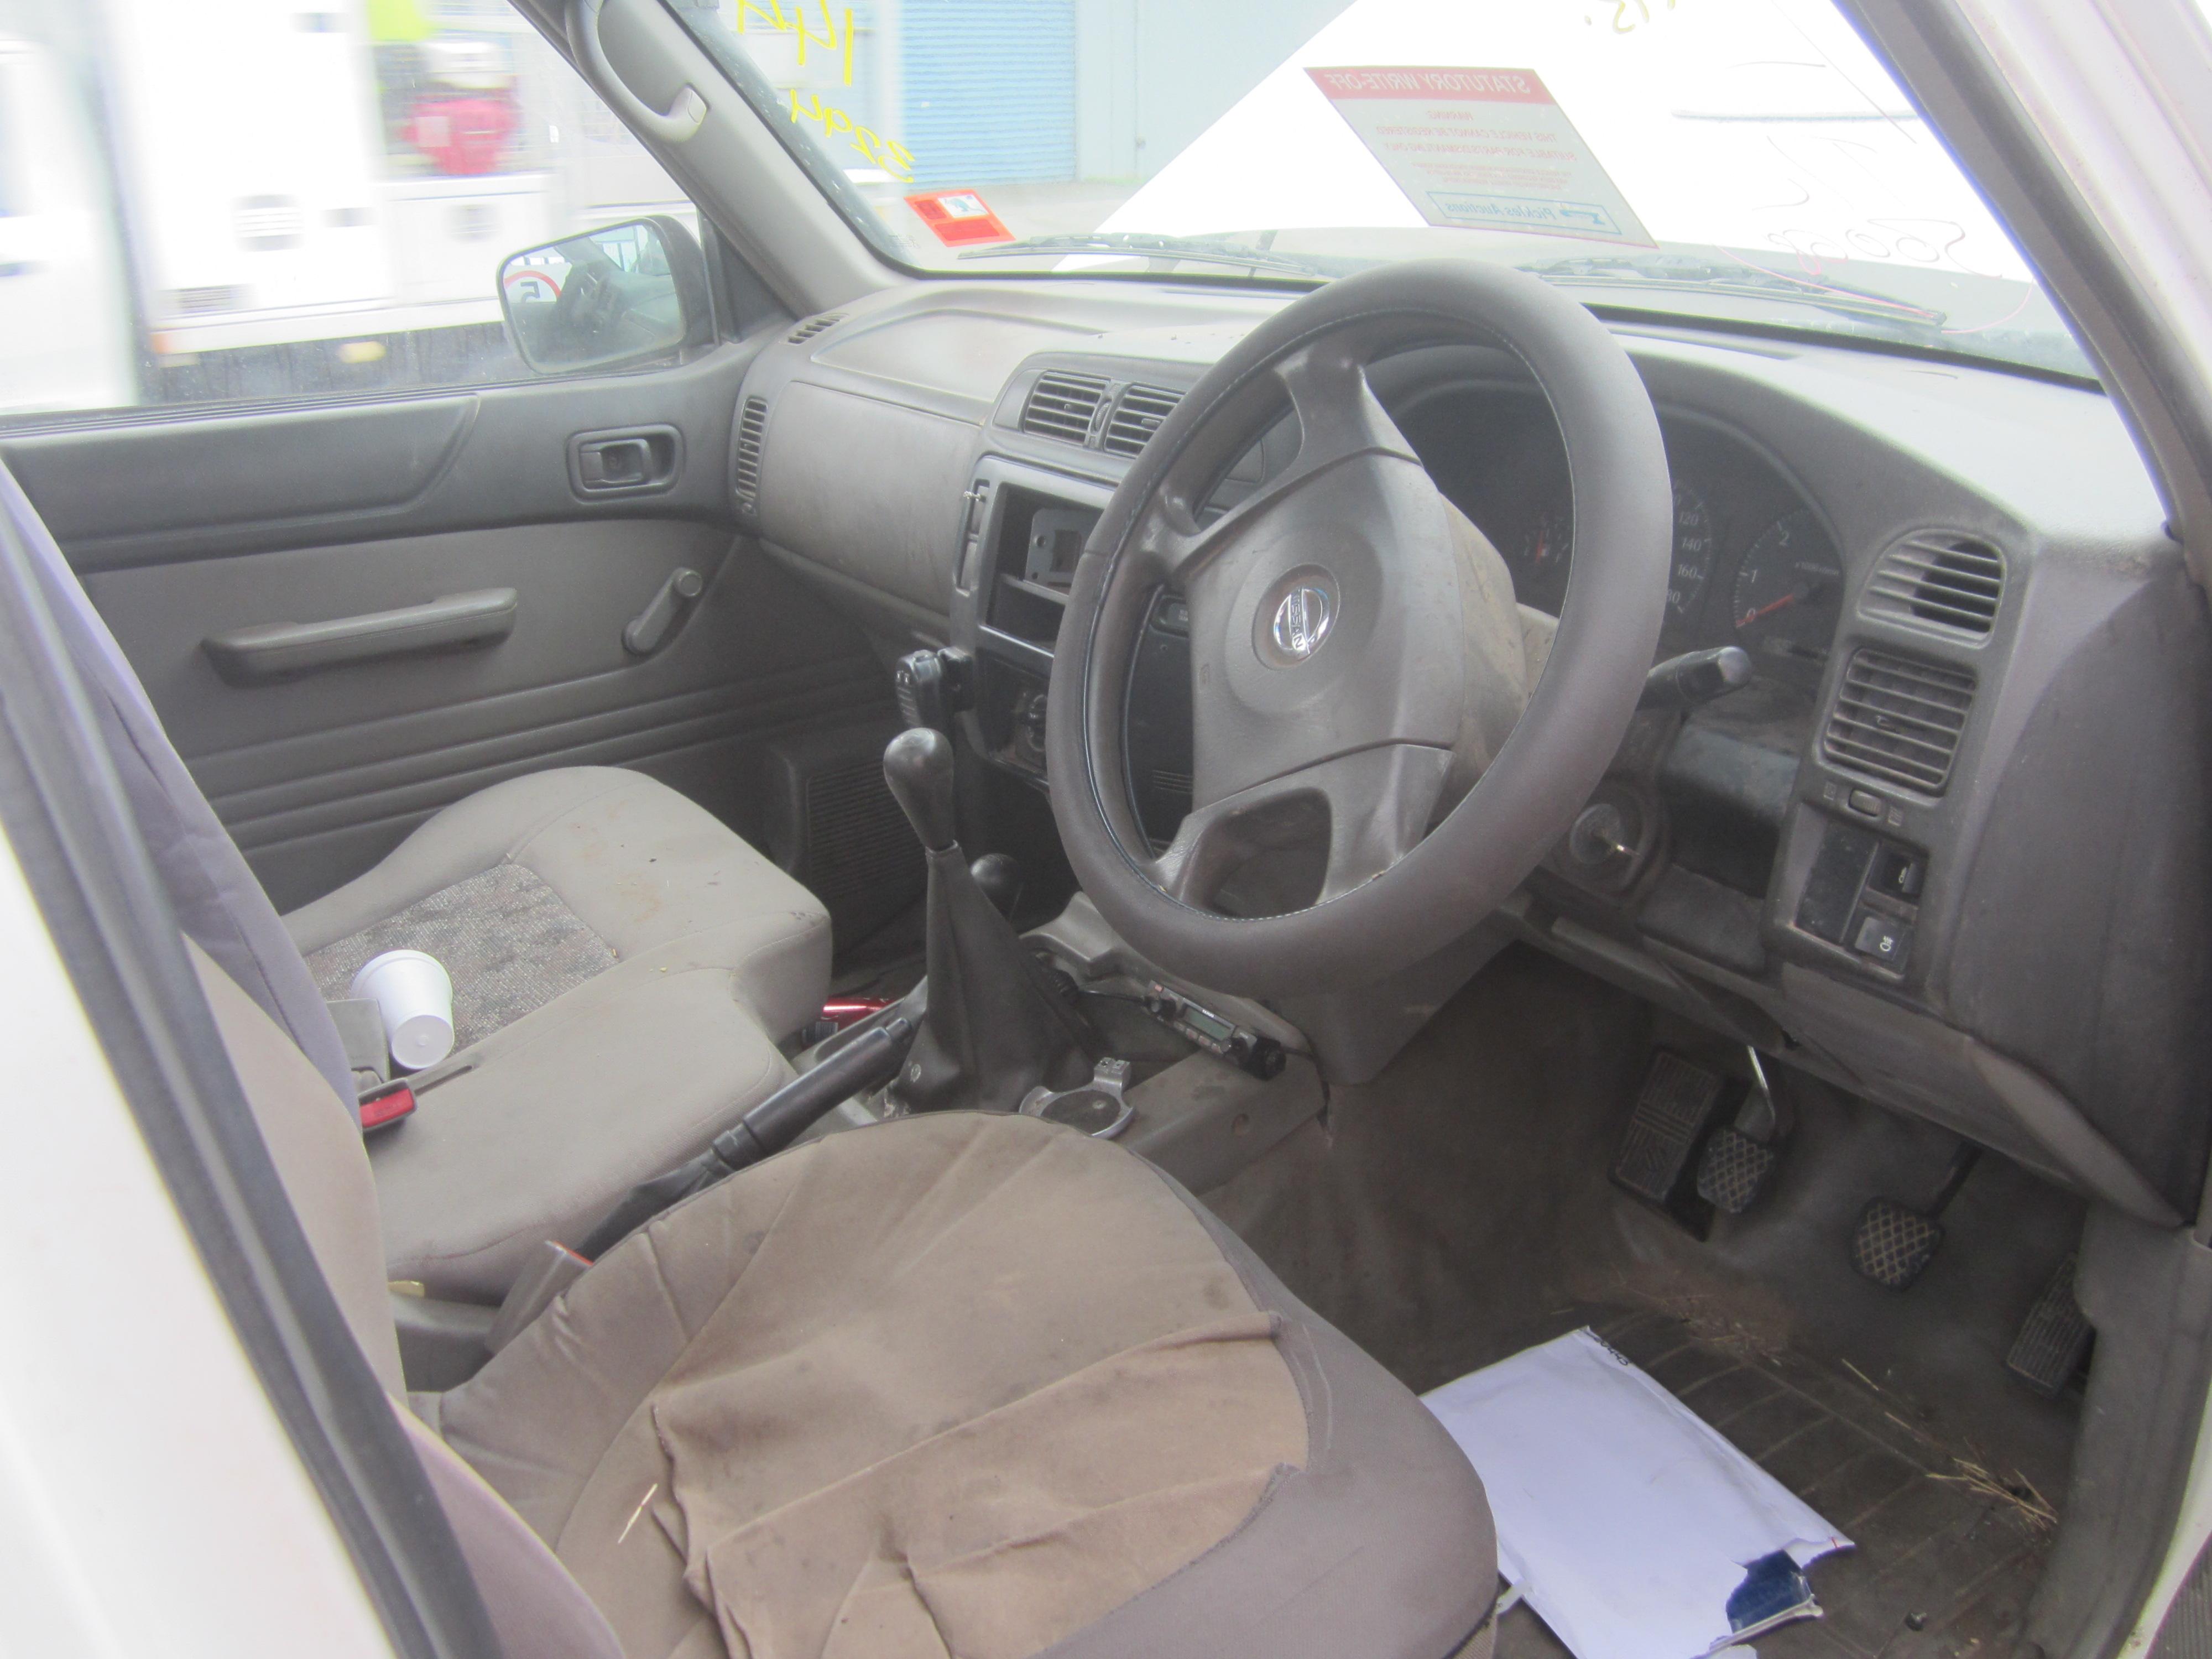 Nissan Patrol Parts Online | Buy Nissan Patrol Spare Parts